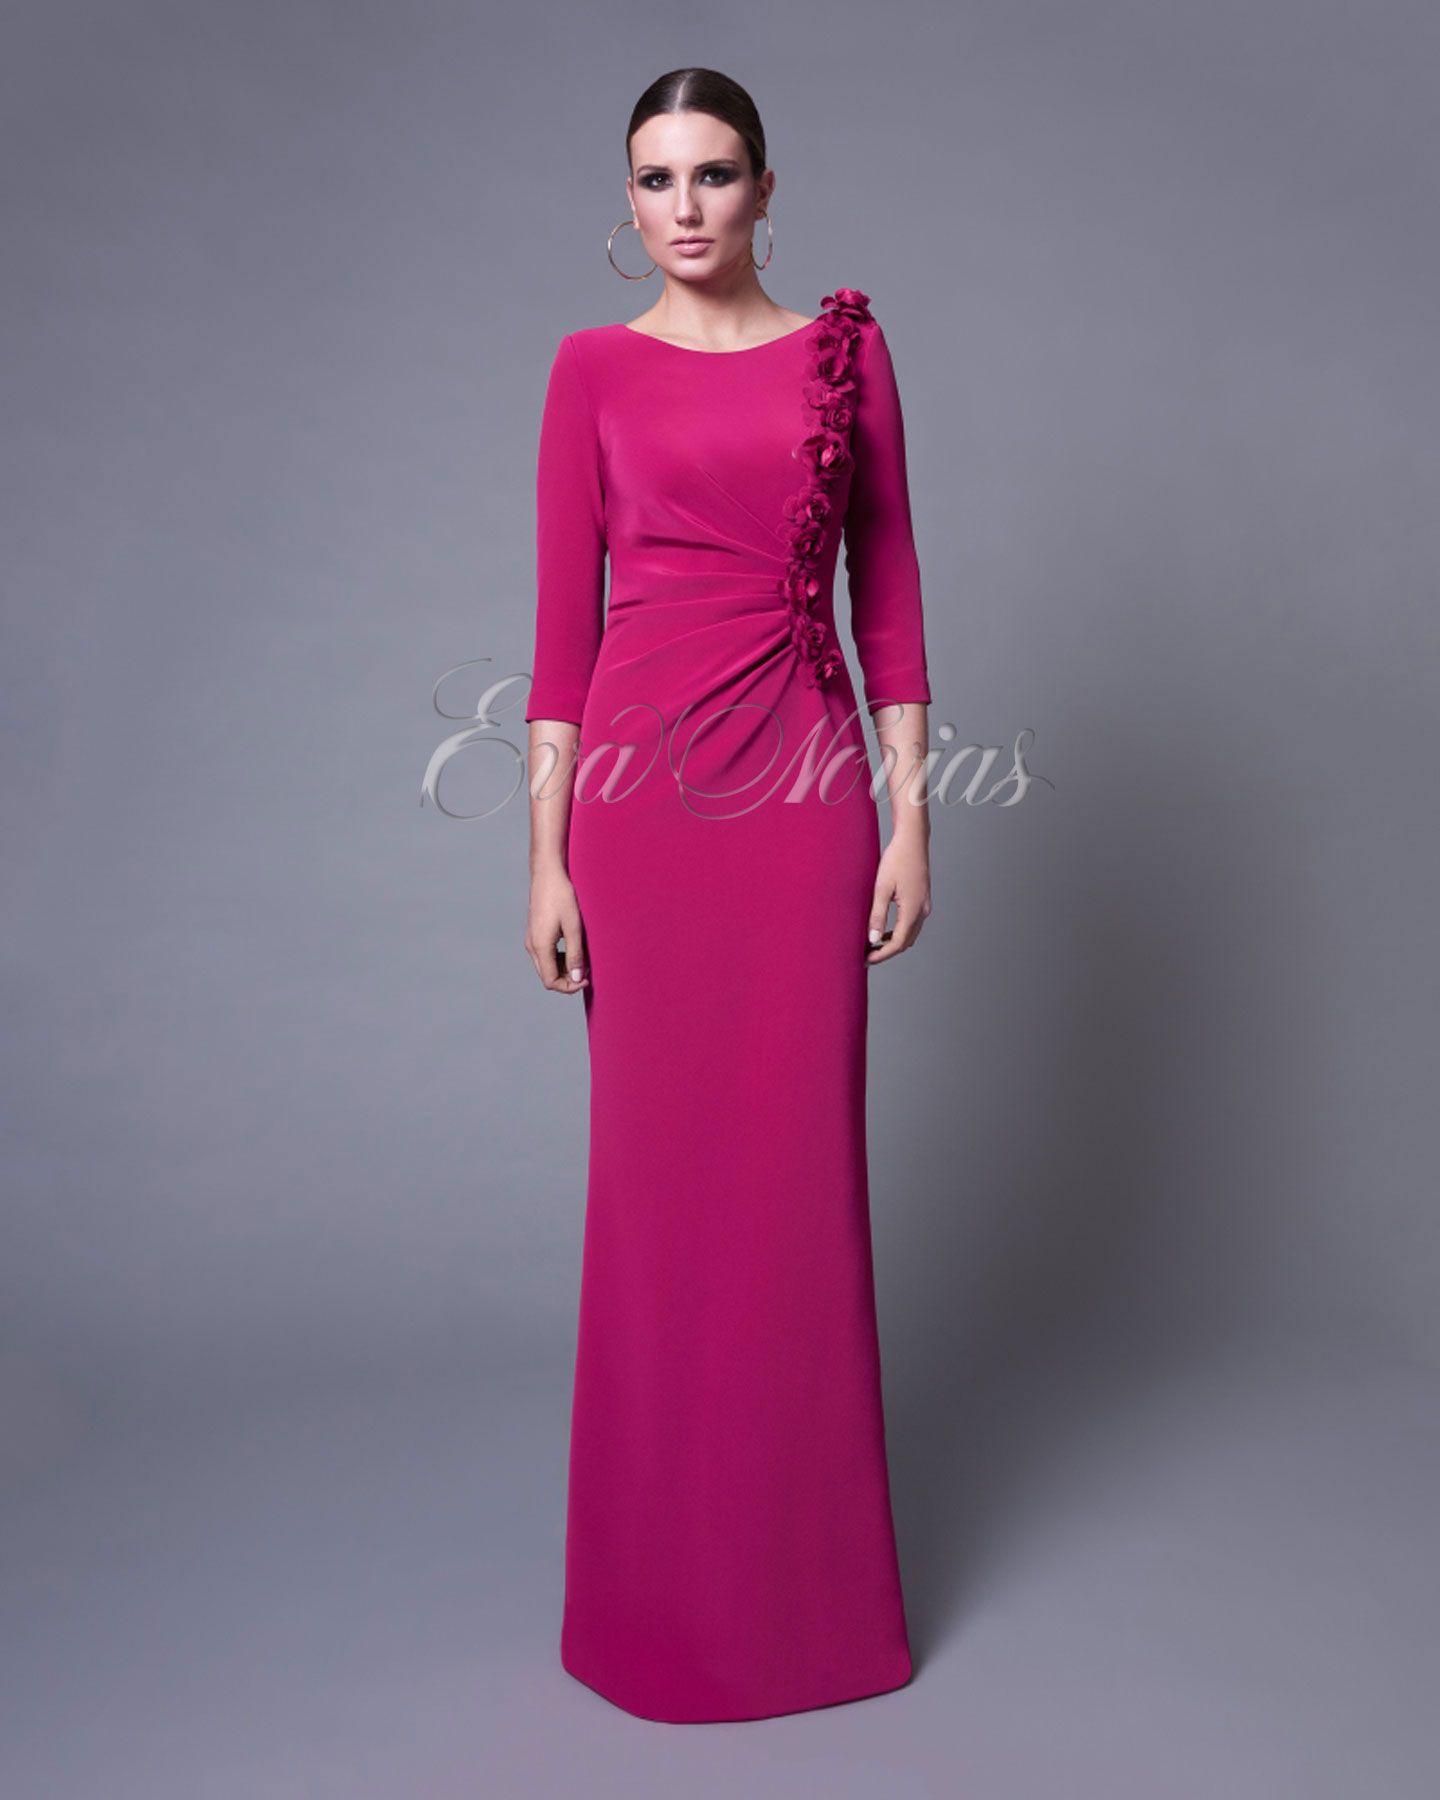 Vestido de fiesta Vicky Martin Berrocal modelo | Vestidos ...